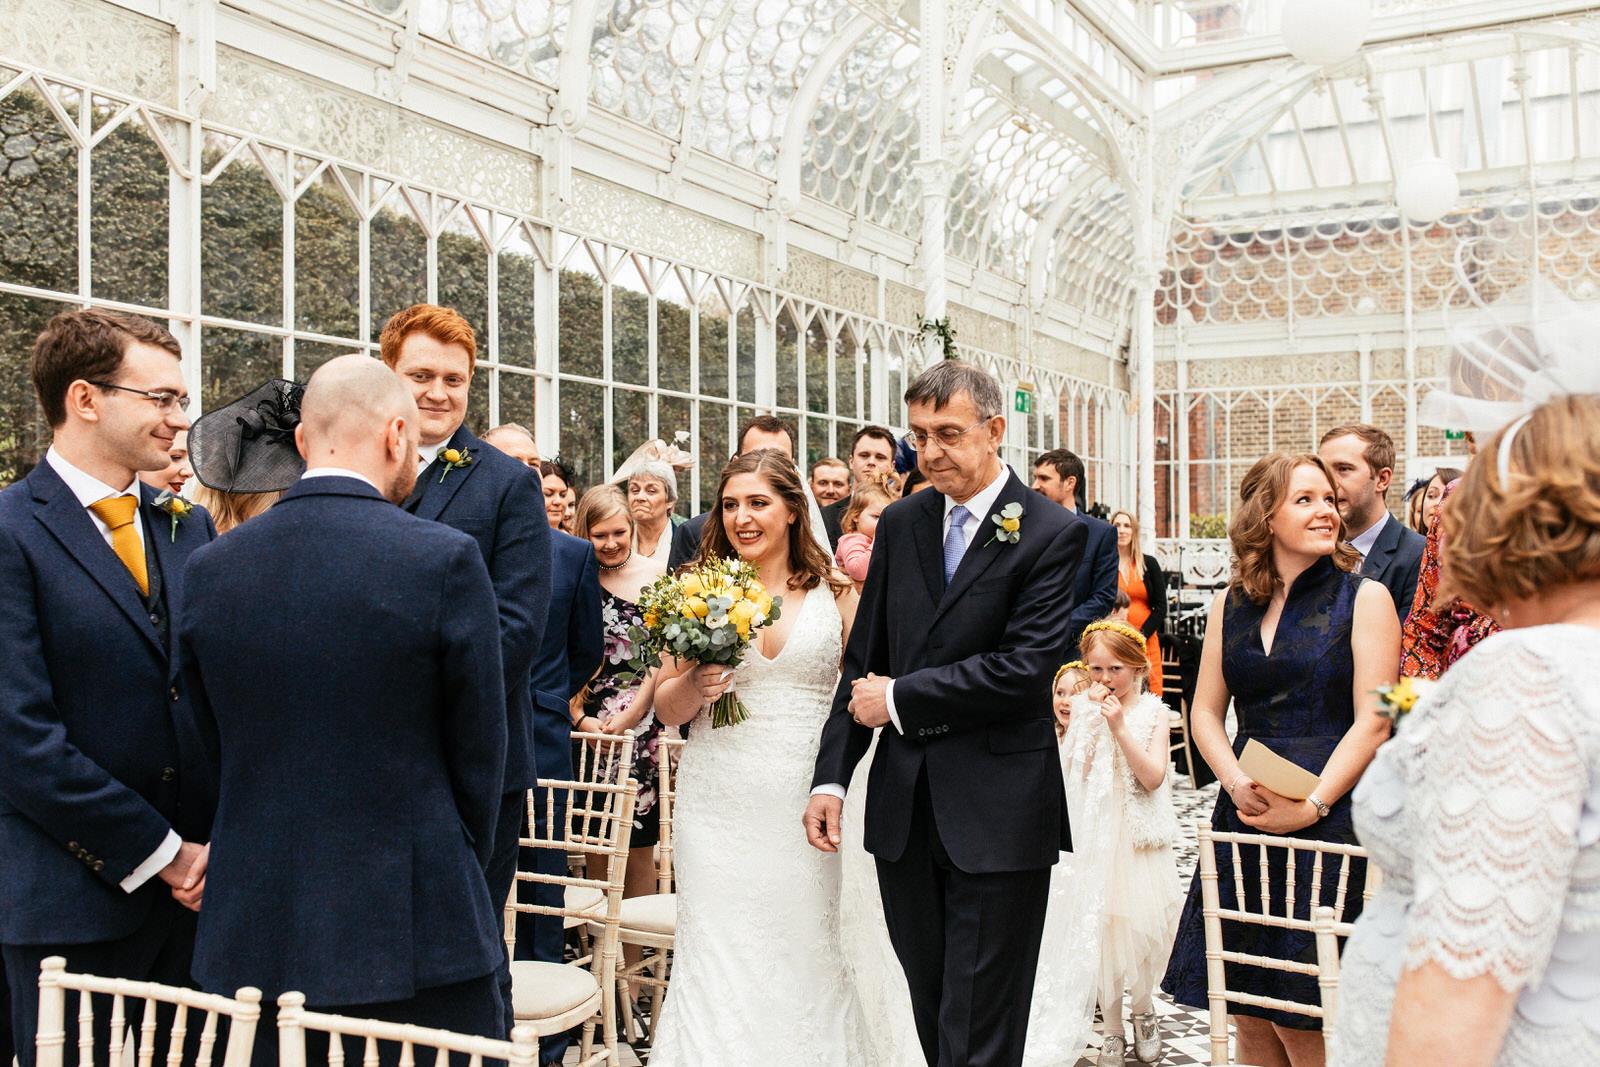 Jenni-and-James-Wedding-Highlights-12.jpg